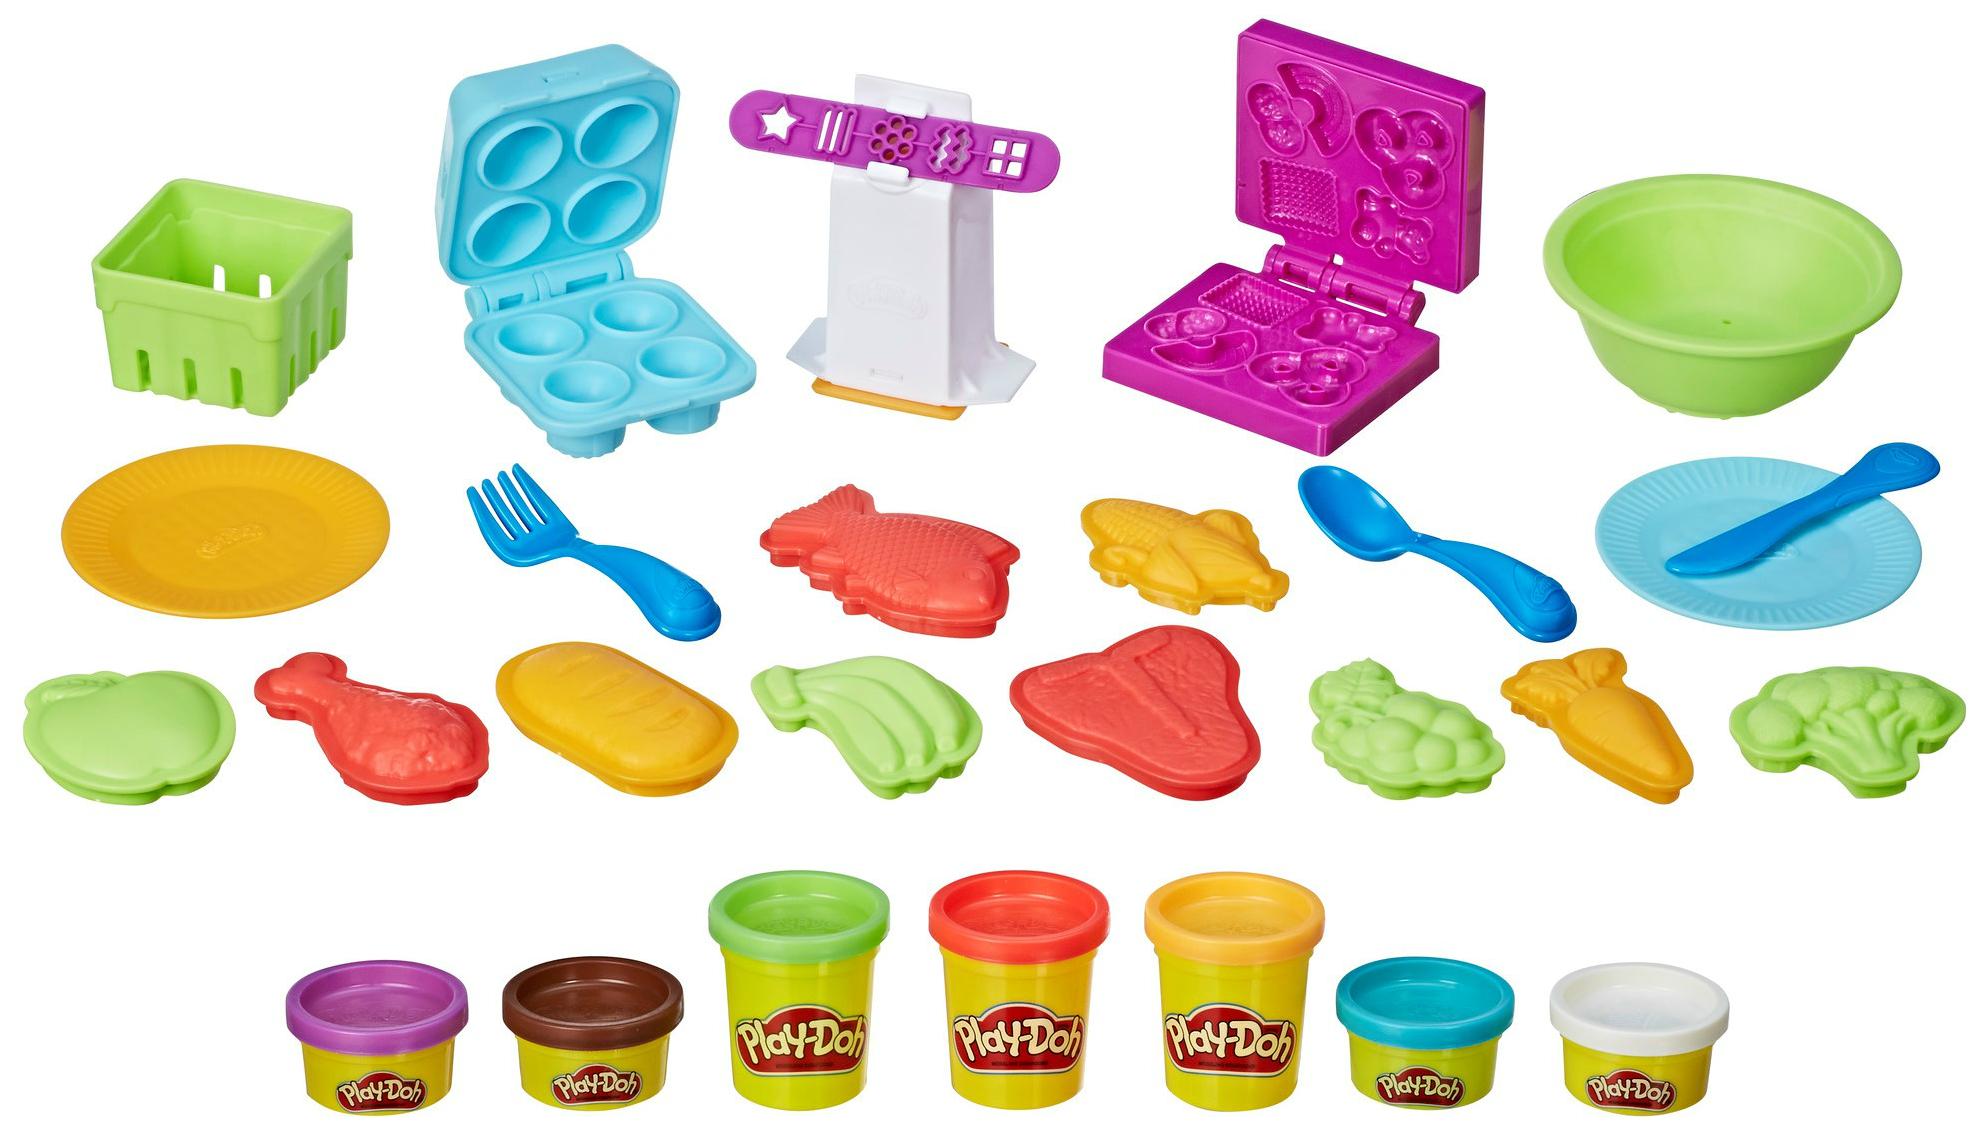 Купить Набор для лепки из пластилина Play-Doh Hasbro Готовим обед, Лепка